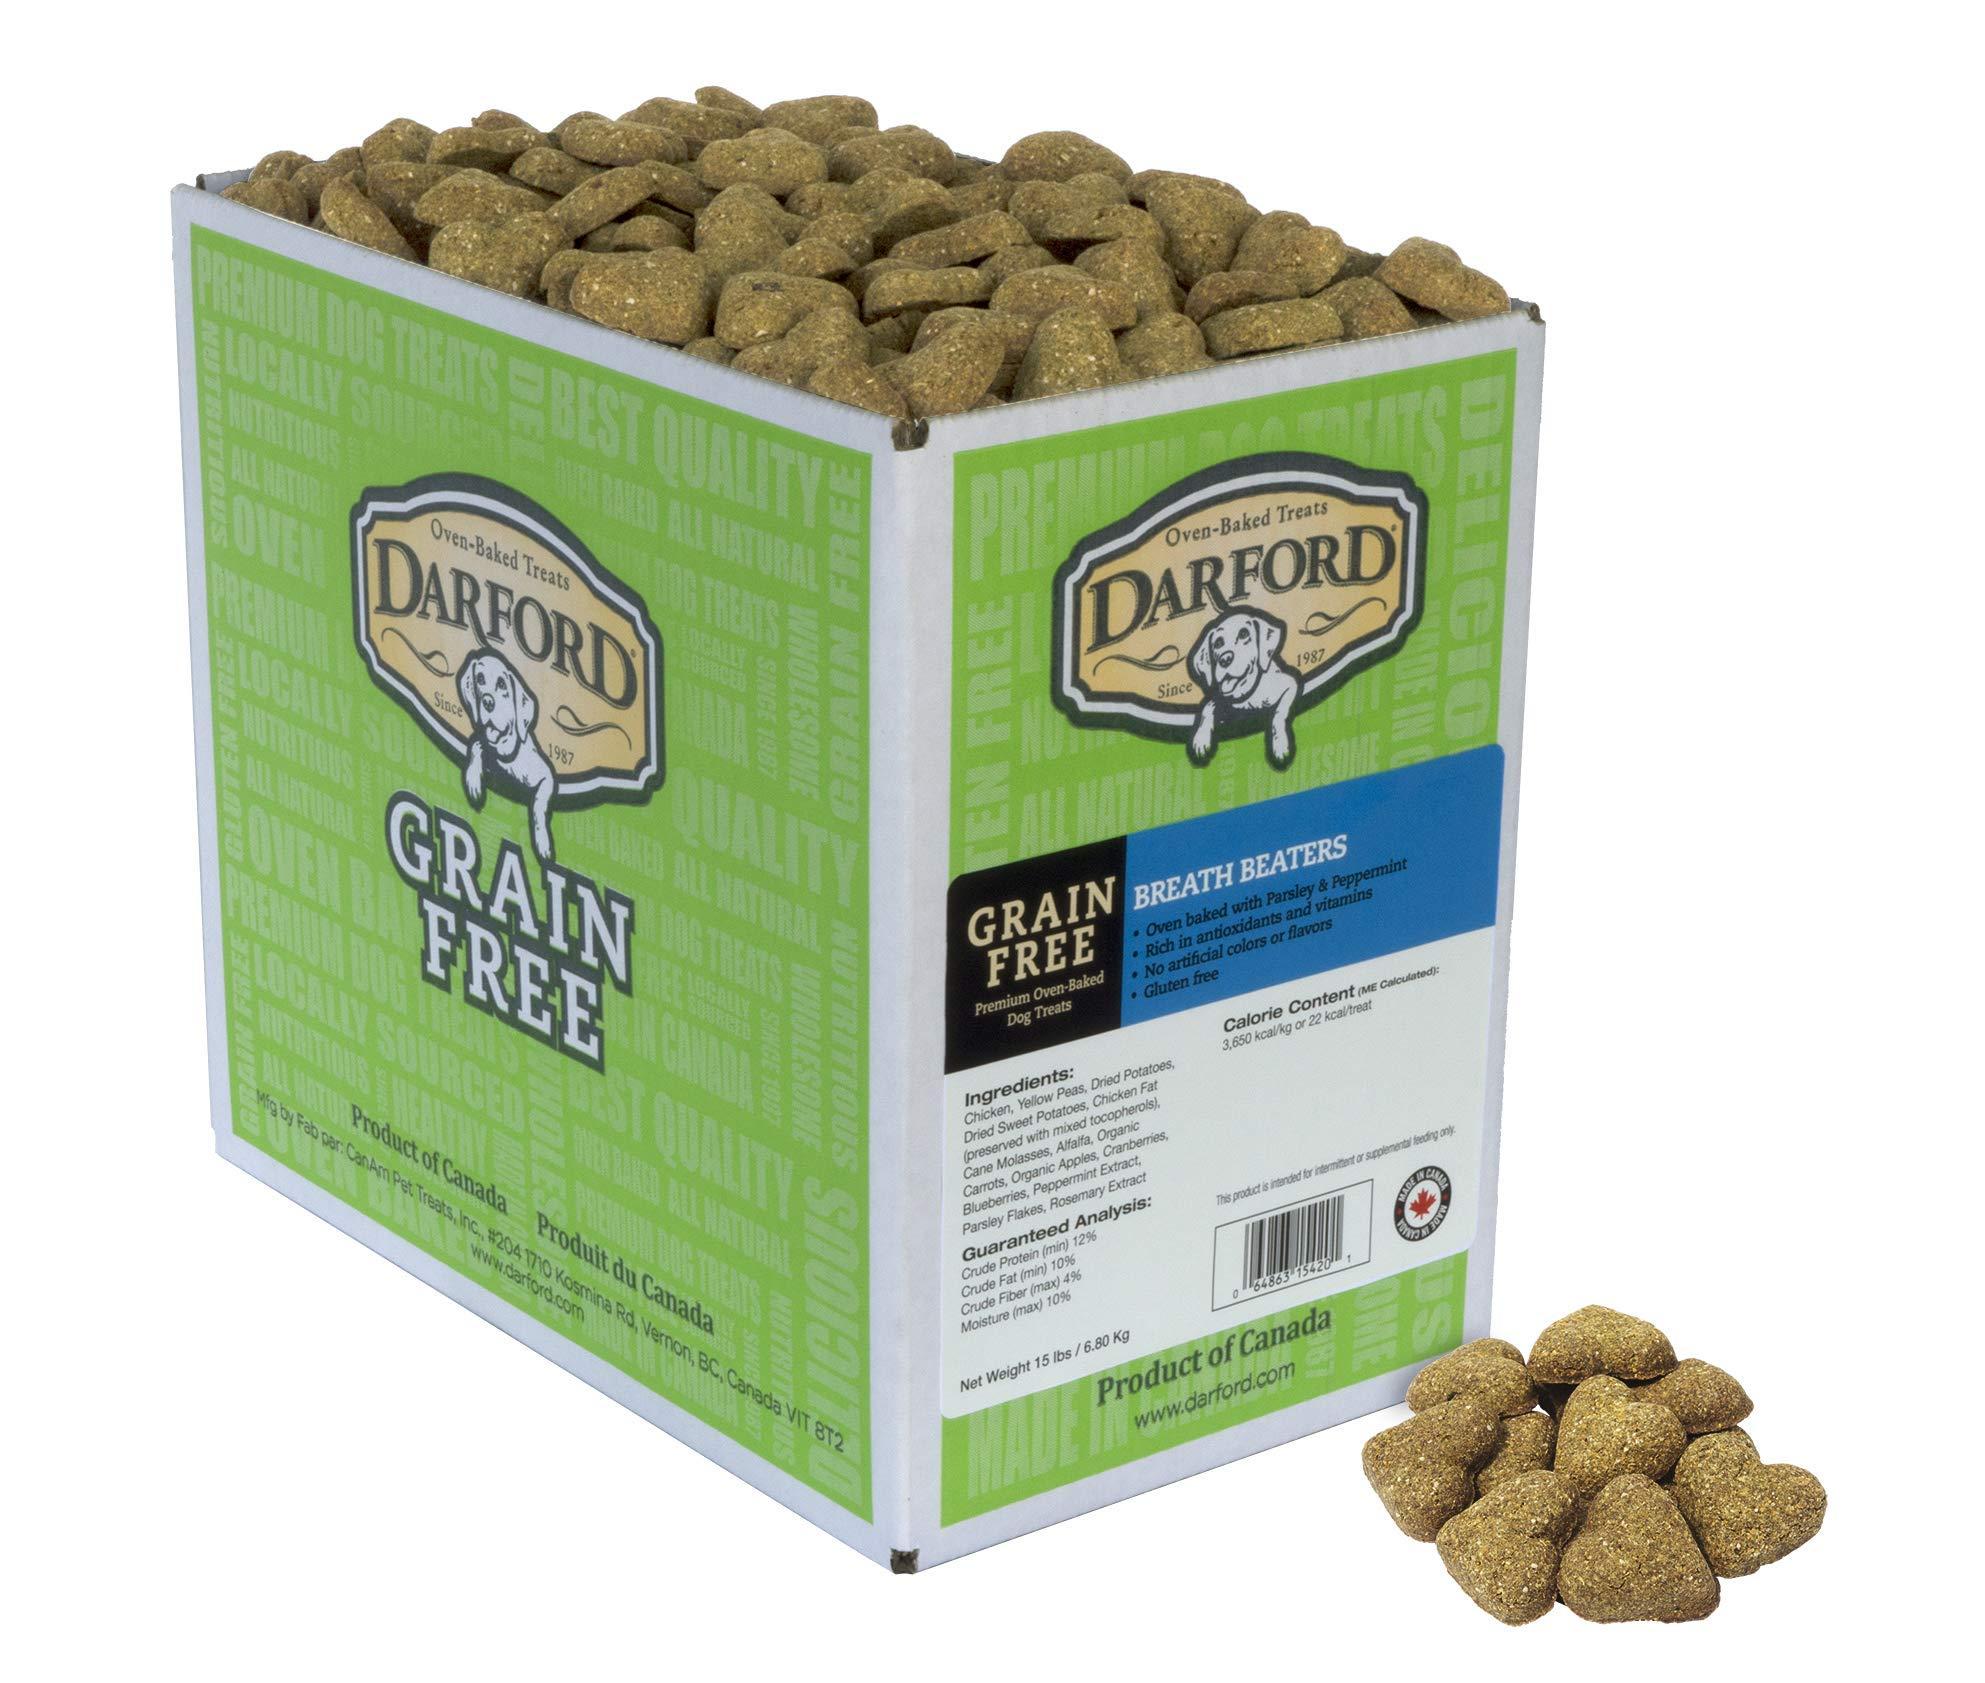 Grain Free Breath Beaters Dog Treats, 15 lb by Darford